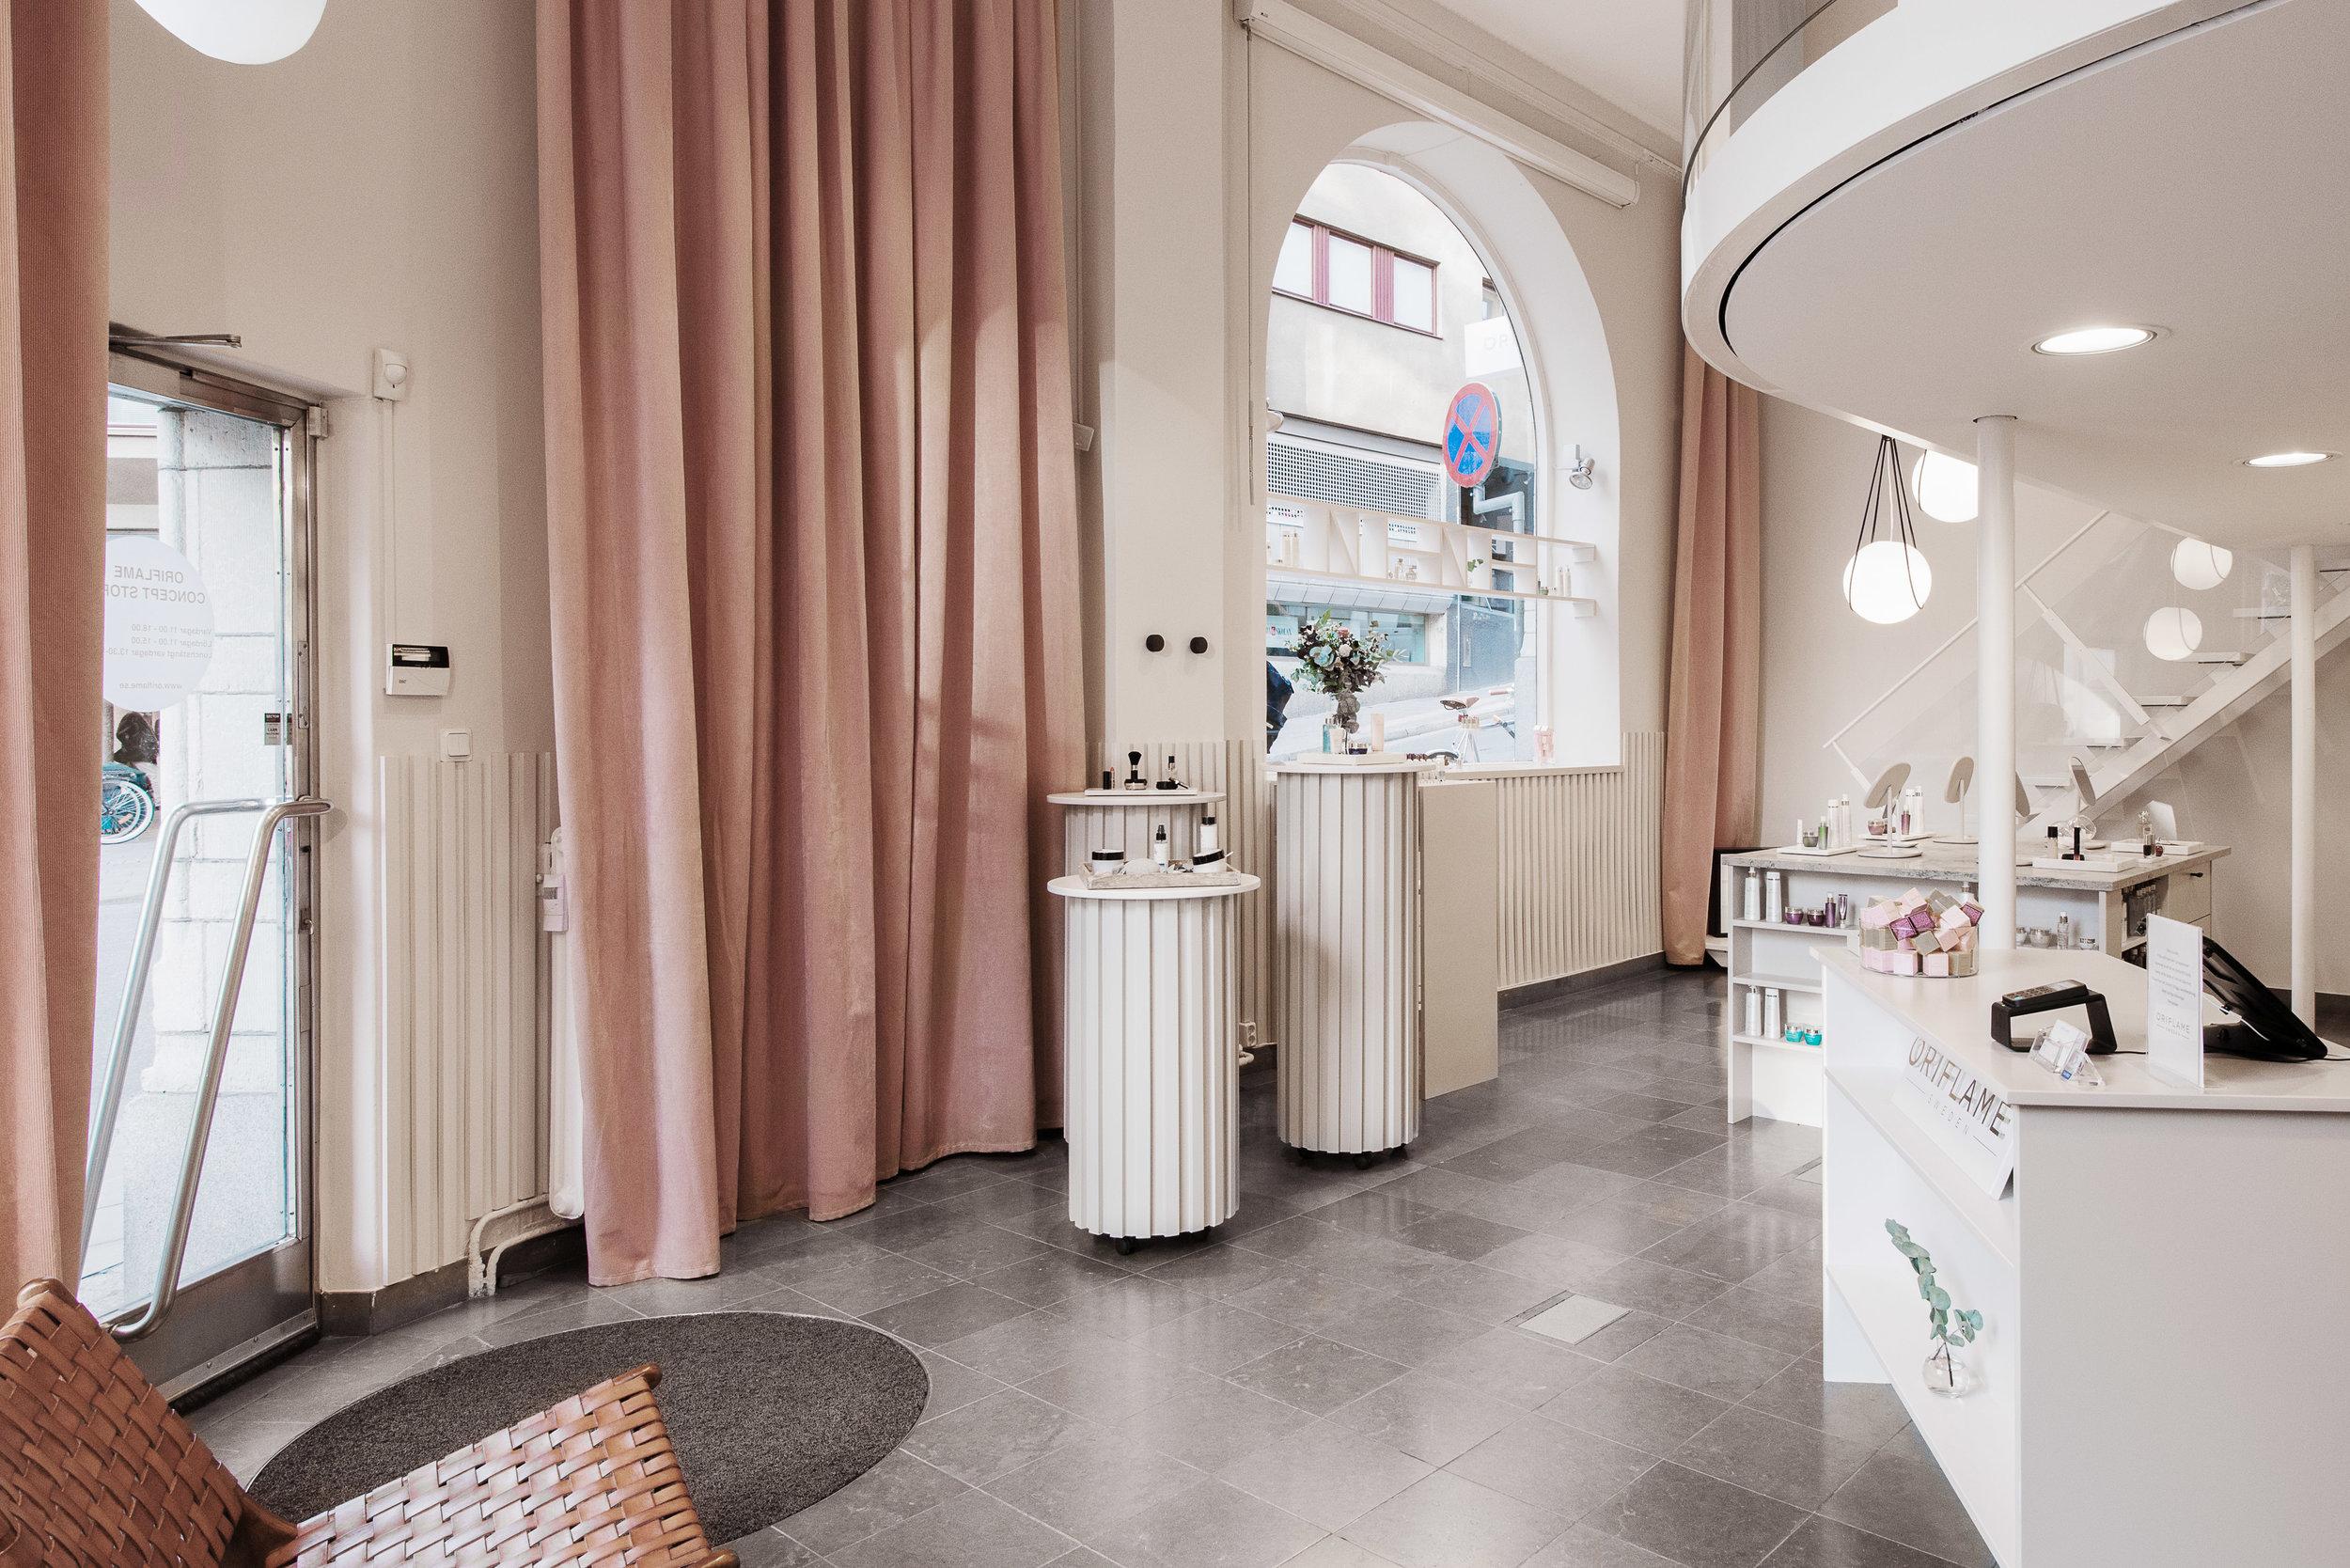 Inredningsarkitekt stockholm butik oriflame 7